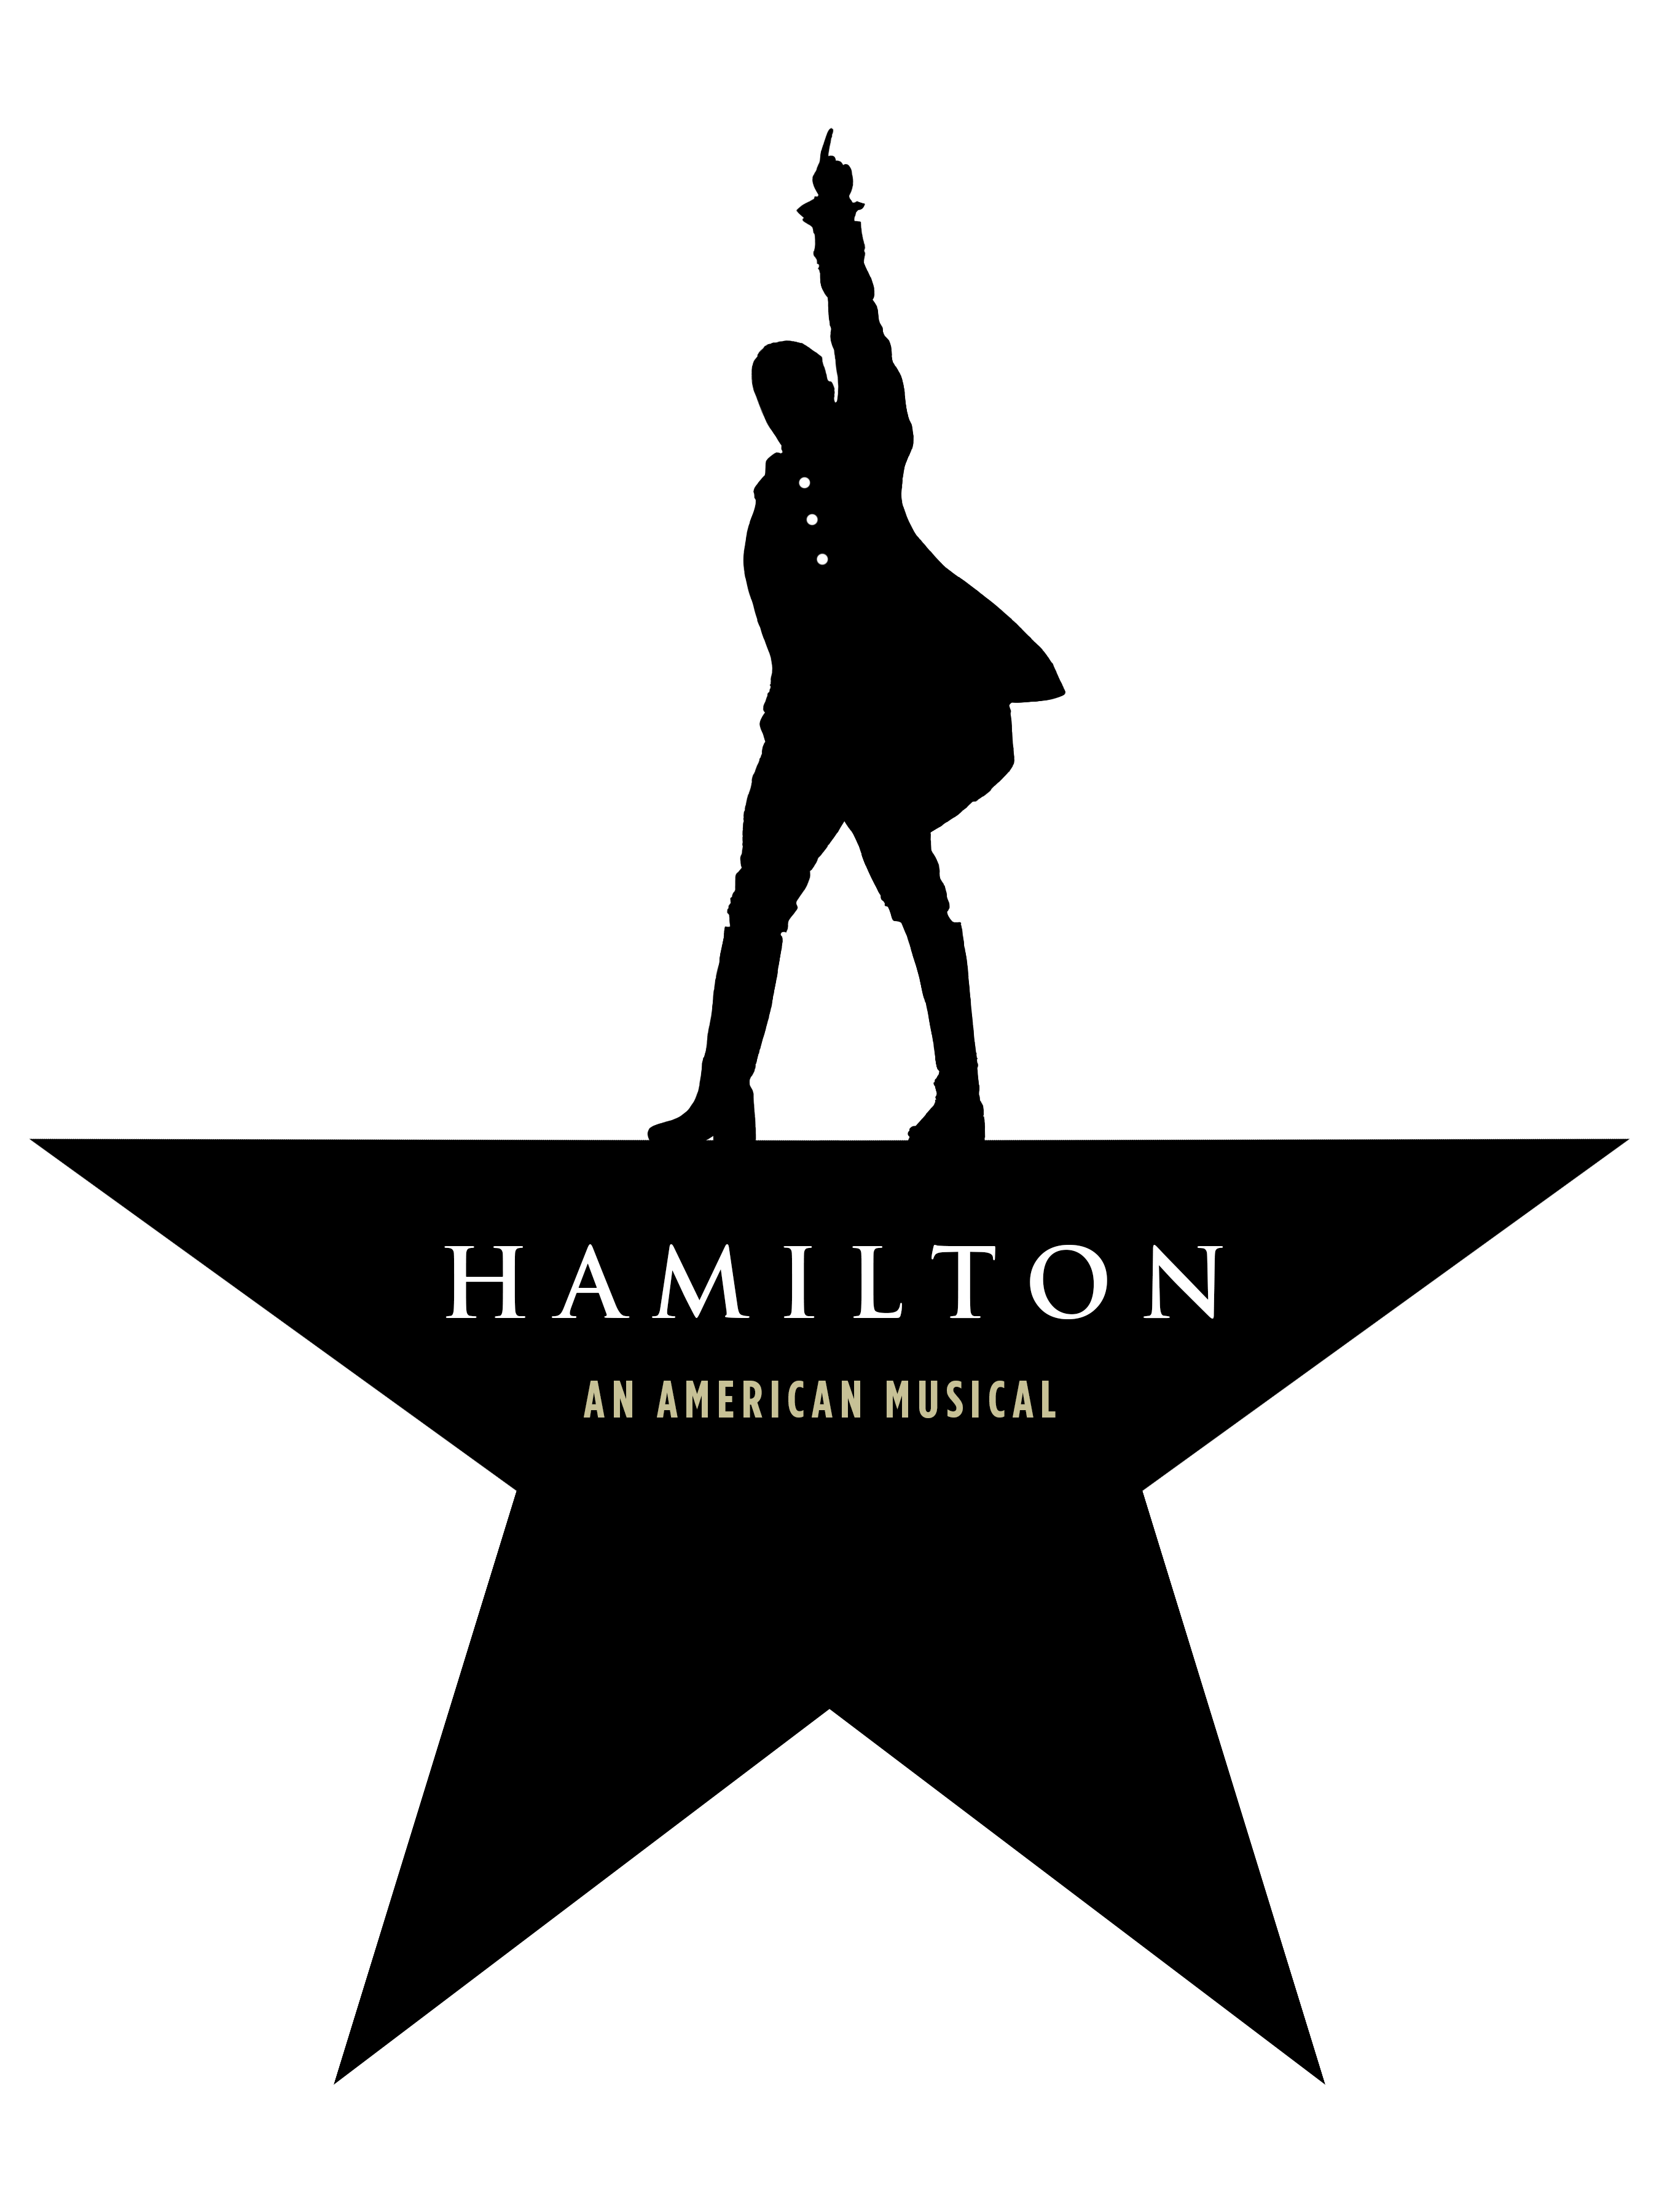 Hamilton Logo High Quality By Doctor Hoolock On Deviantart Hamilton Logo Hamilton Wallpaper Hamilton